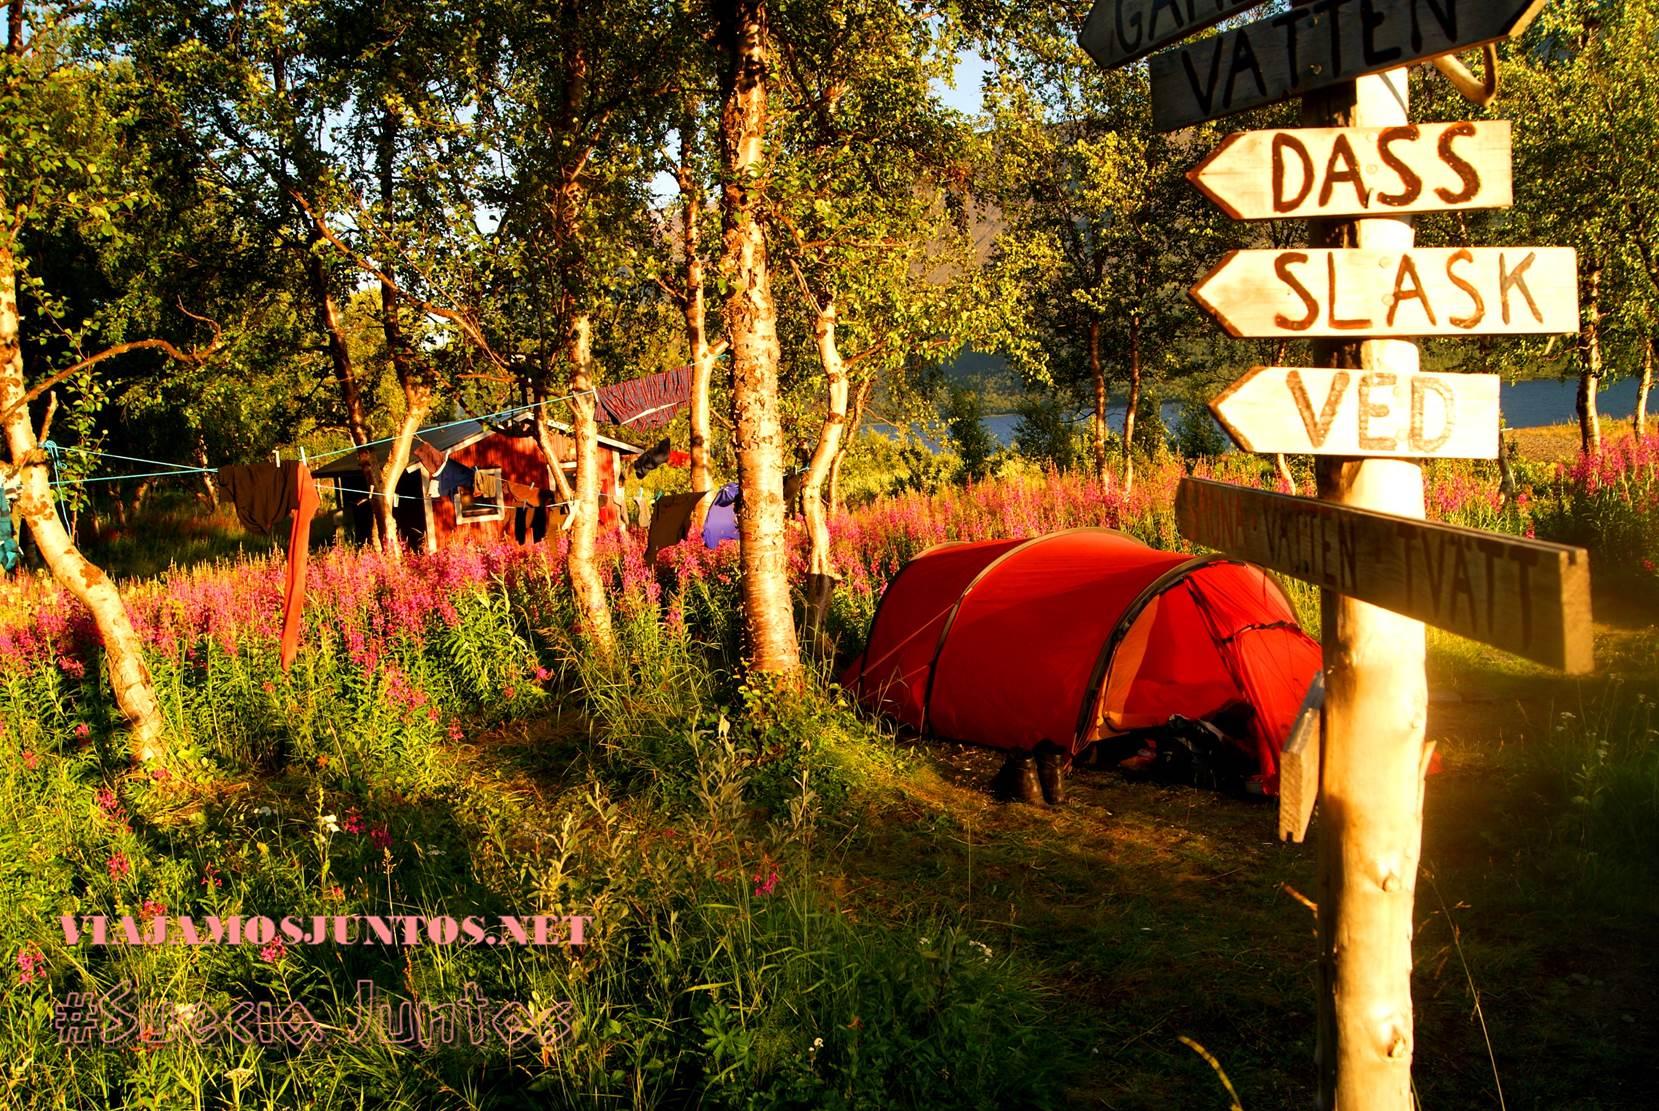 Suecia, Kungsleden, senderismo, trekkings, rutas, afrontar, tips, consejos